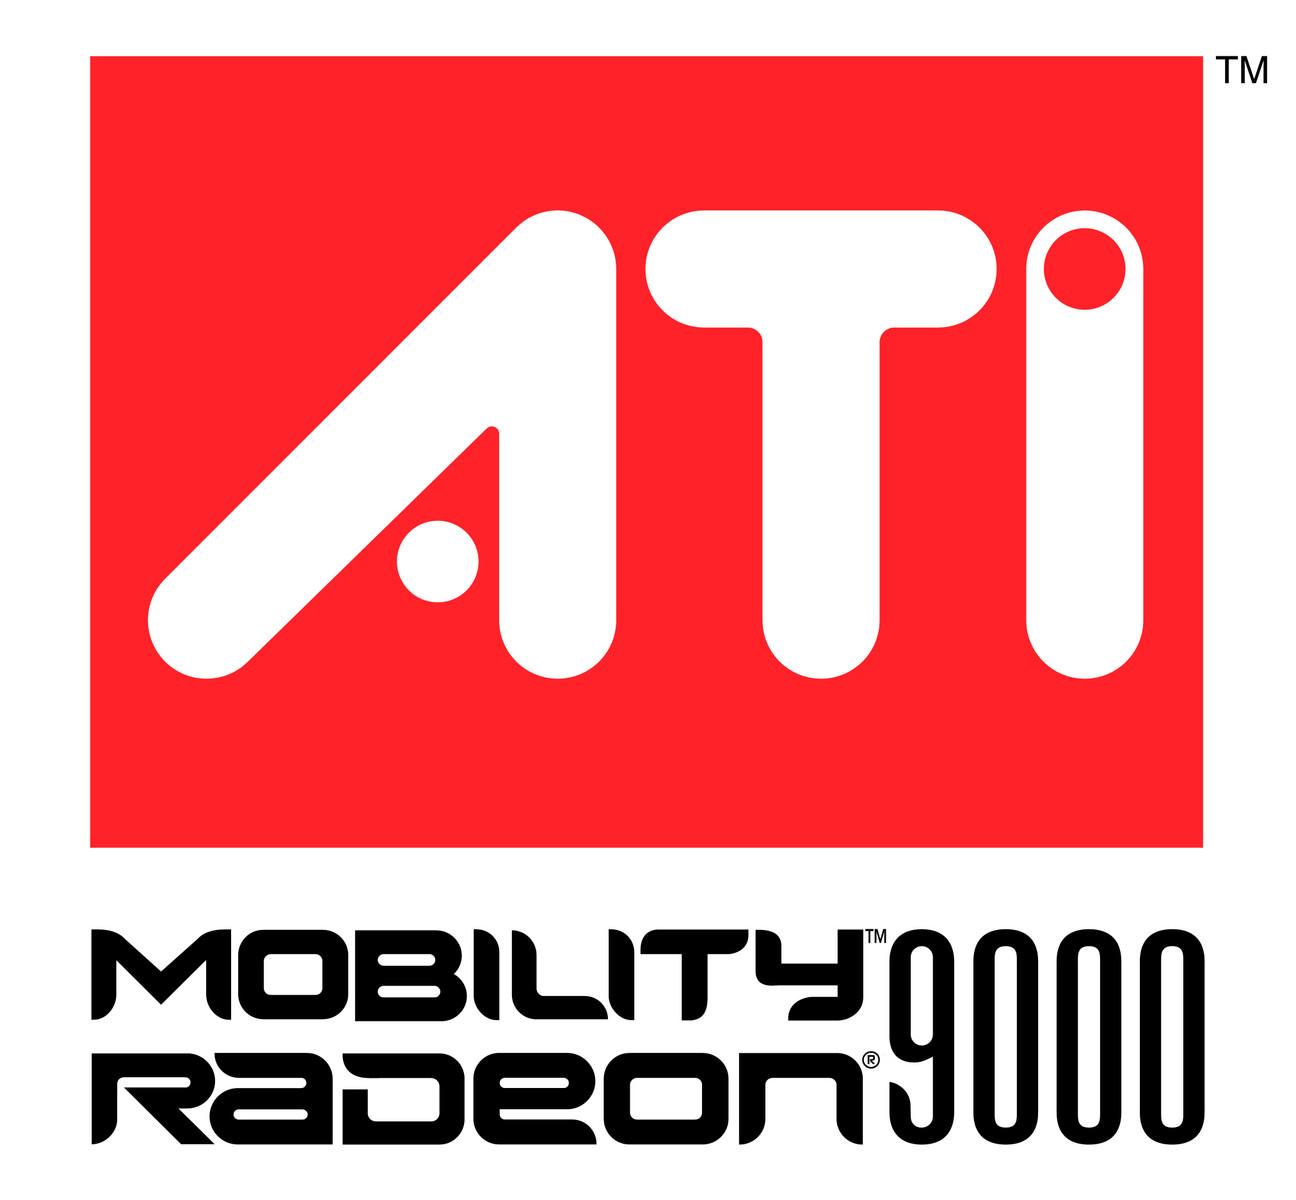 ATI Mobility Radeon 9000 - NotebookCheck.net Tech